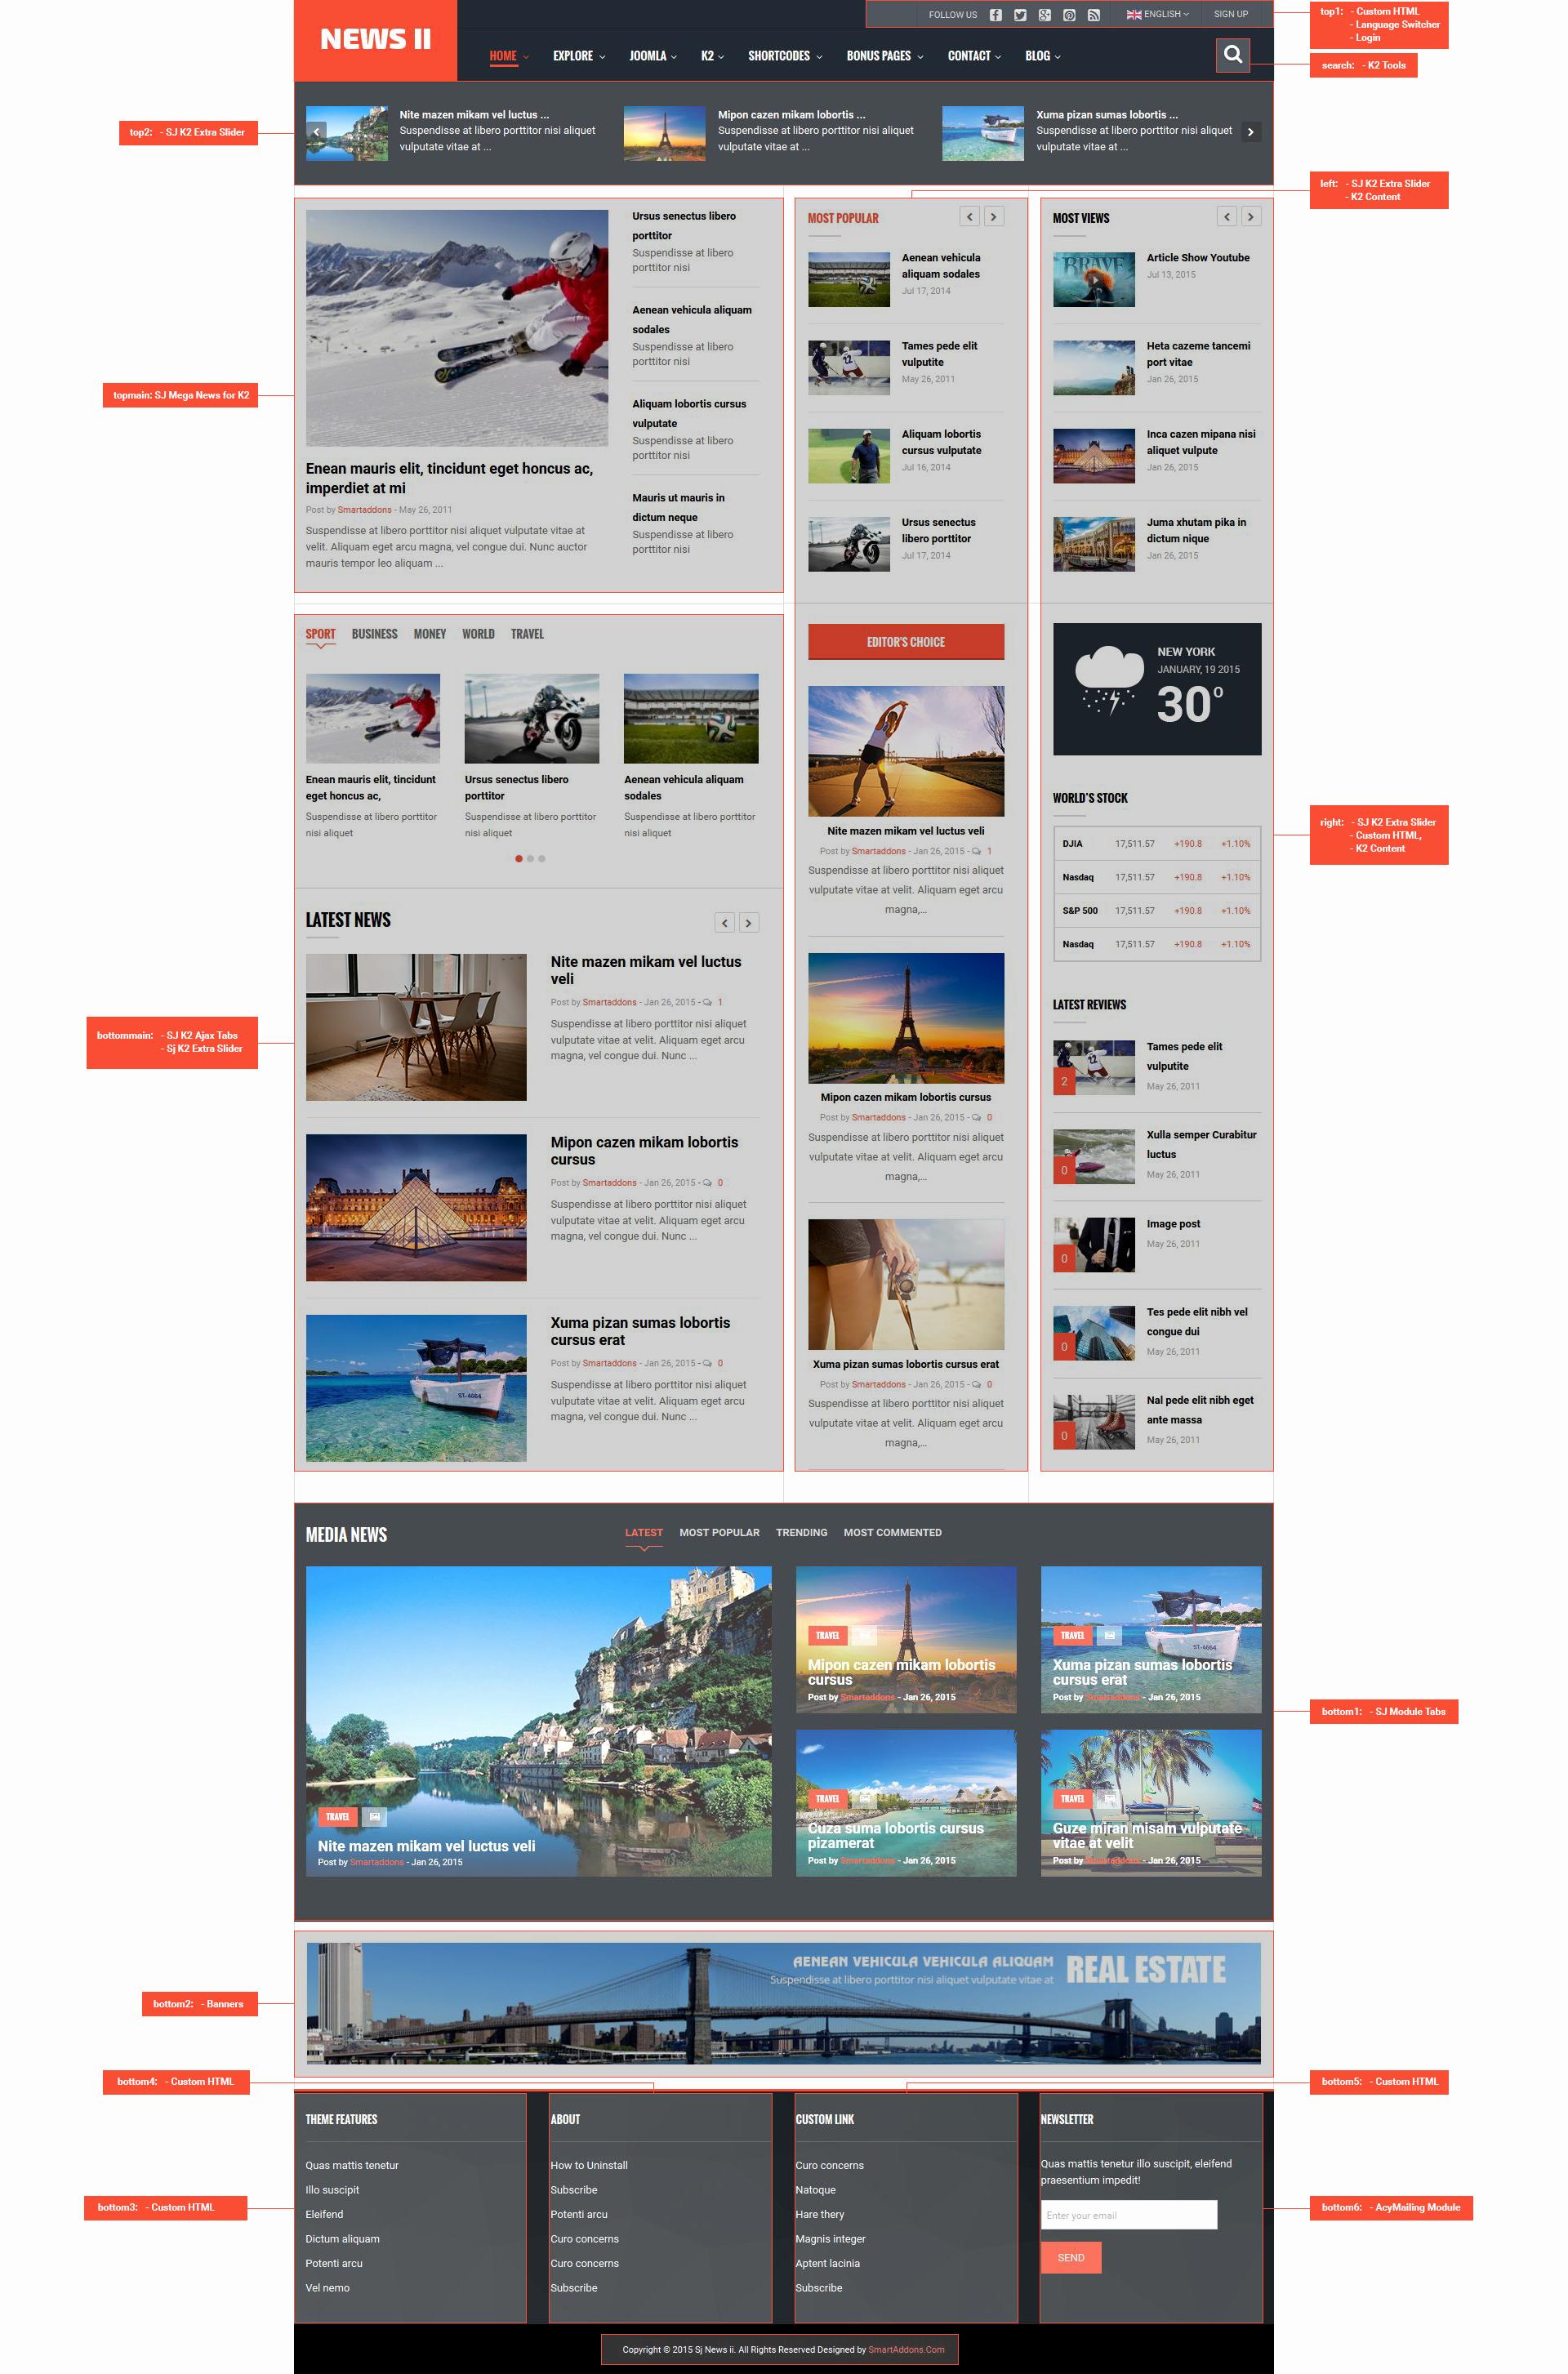 Free Responsive Joomla News Magazine Template Sj News Ii